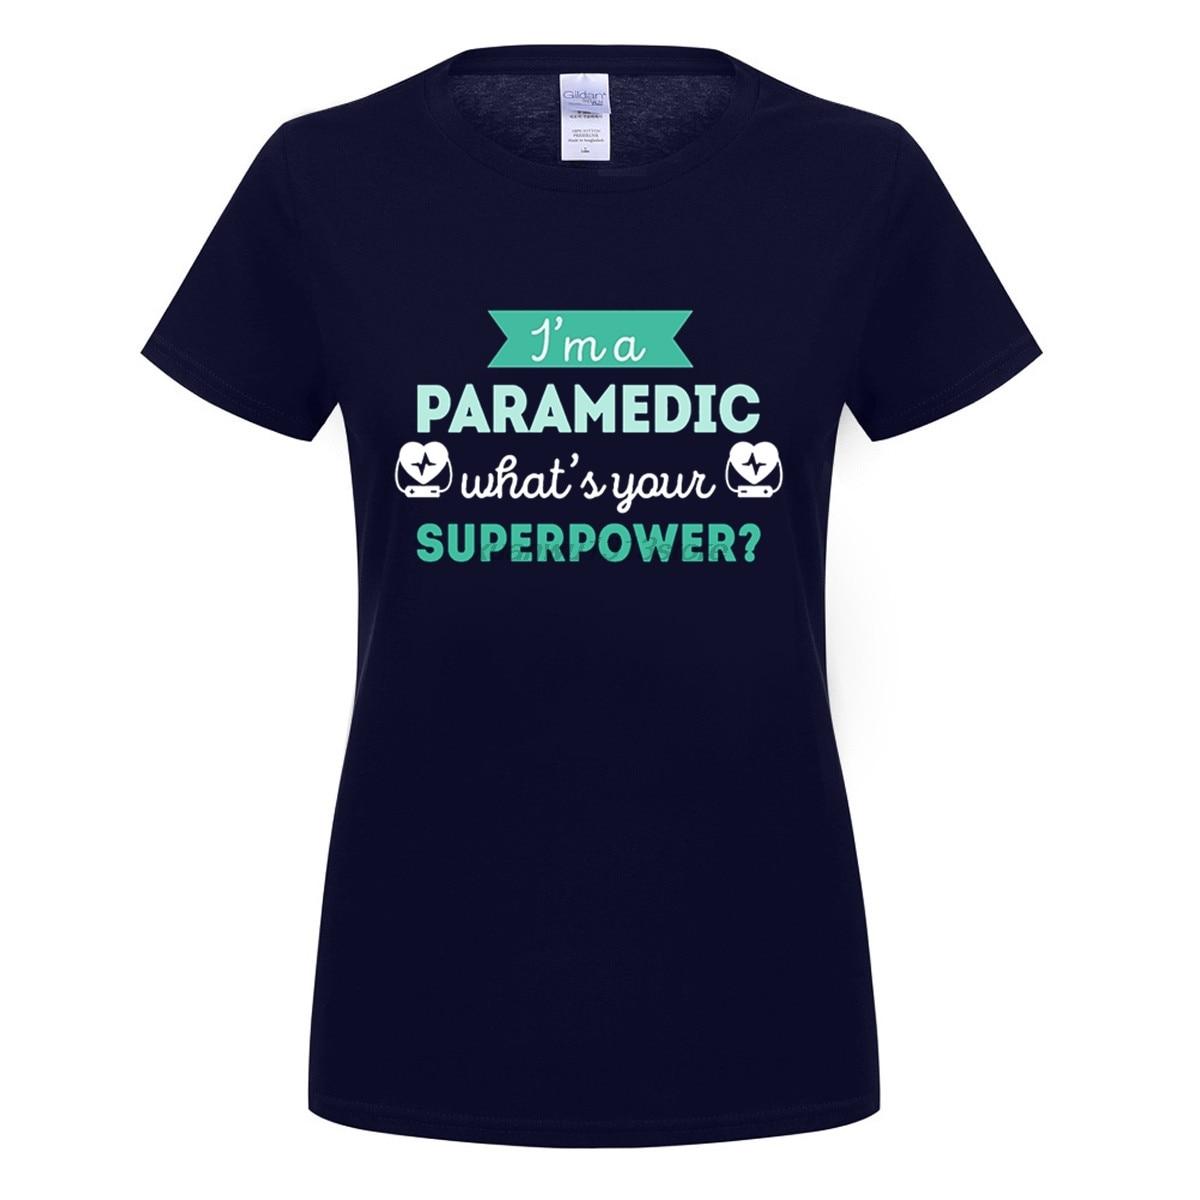 Gildan Paramedic Superpower Profession Healthcare T Shirt Women